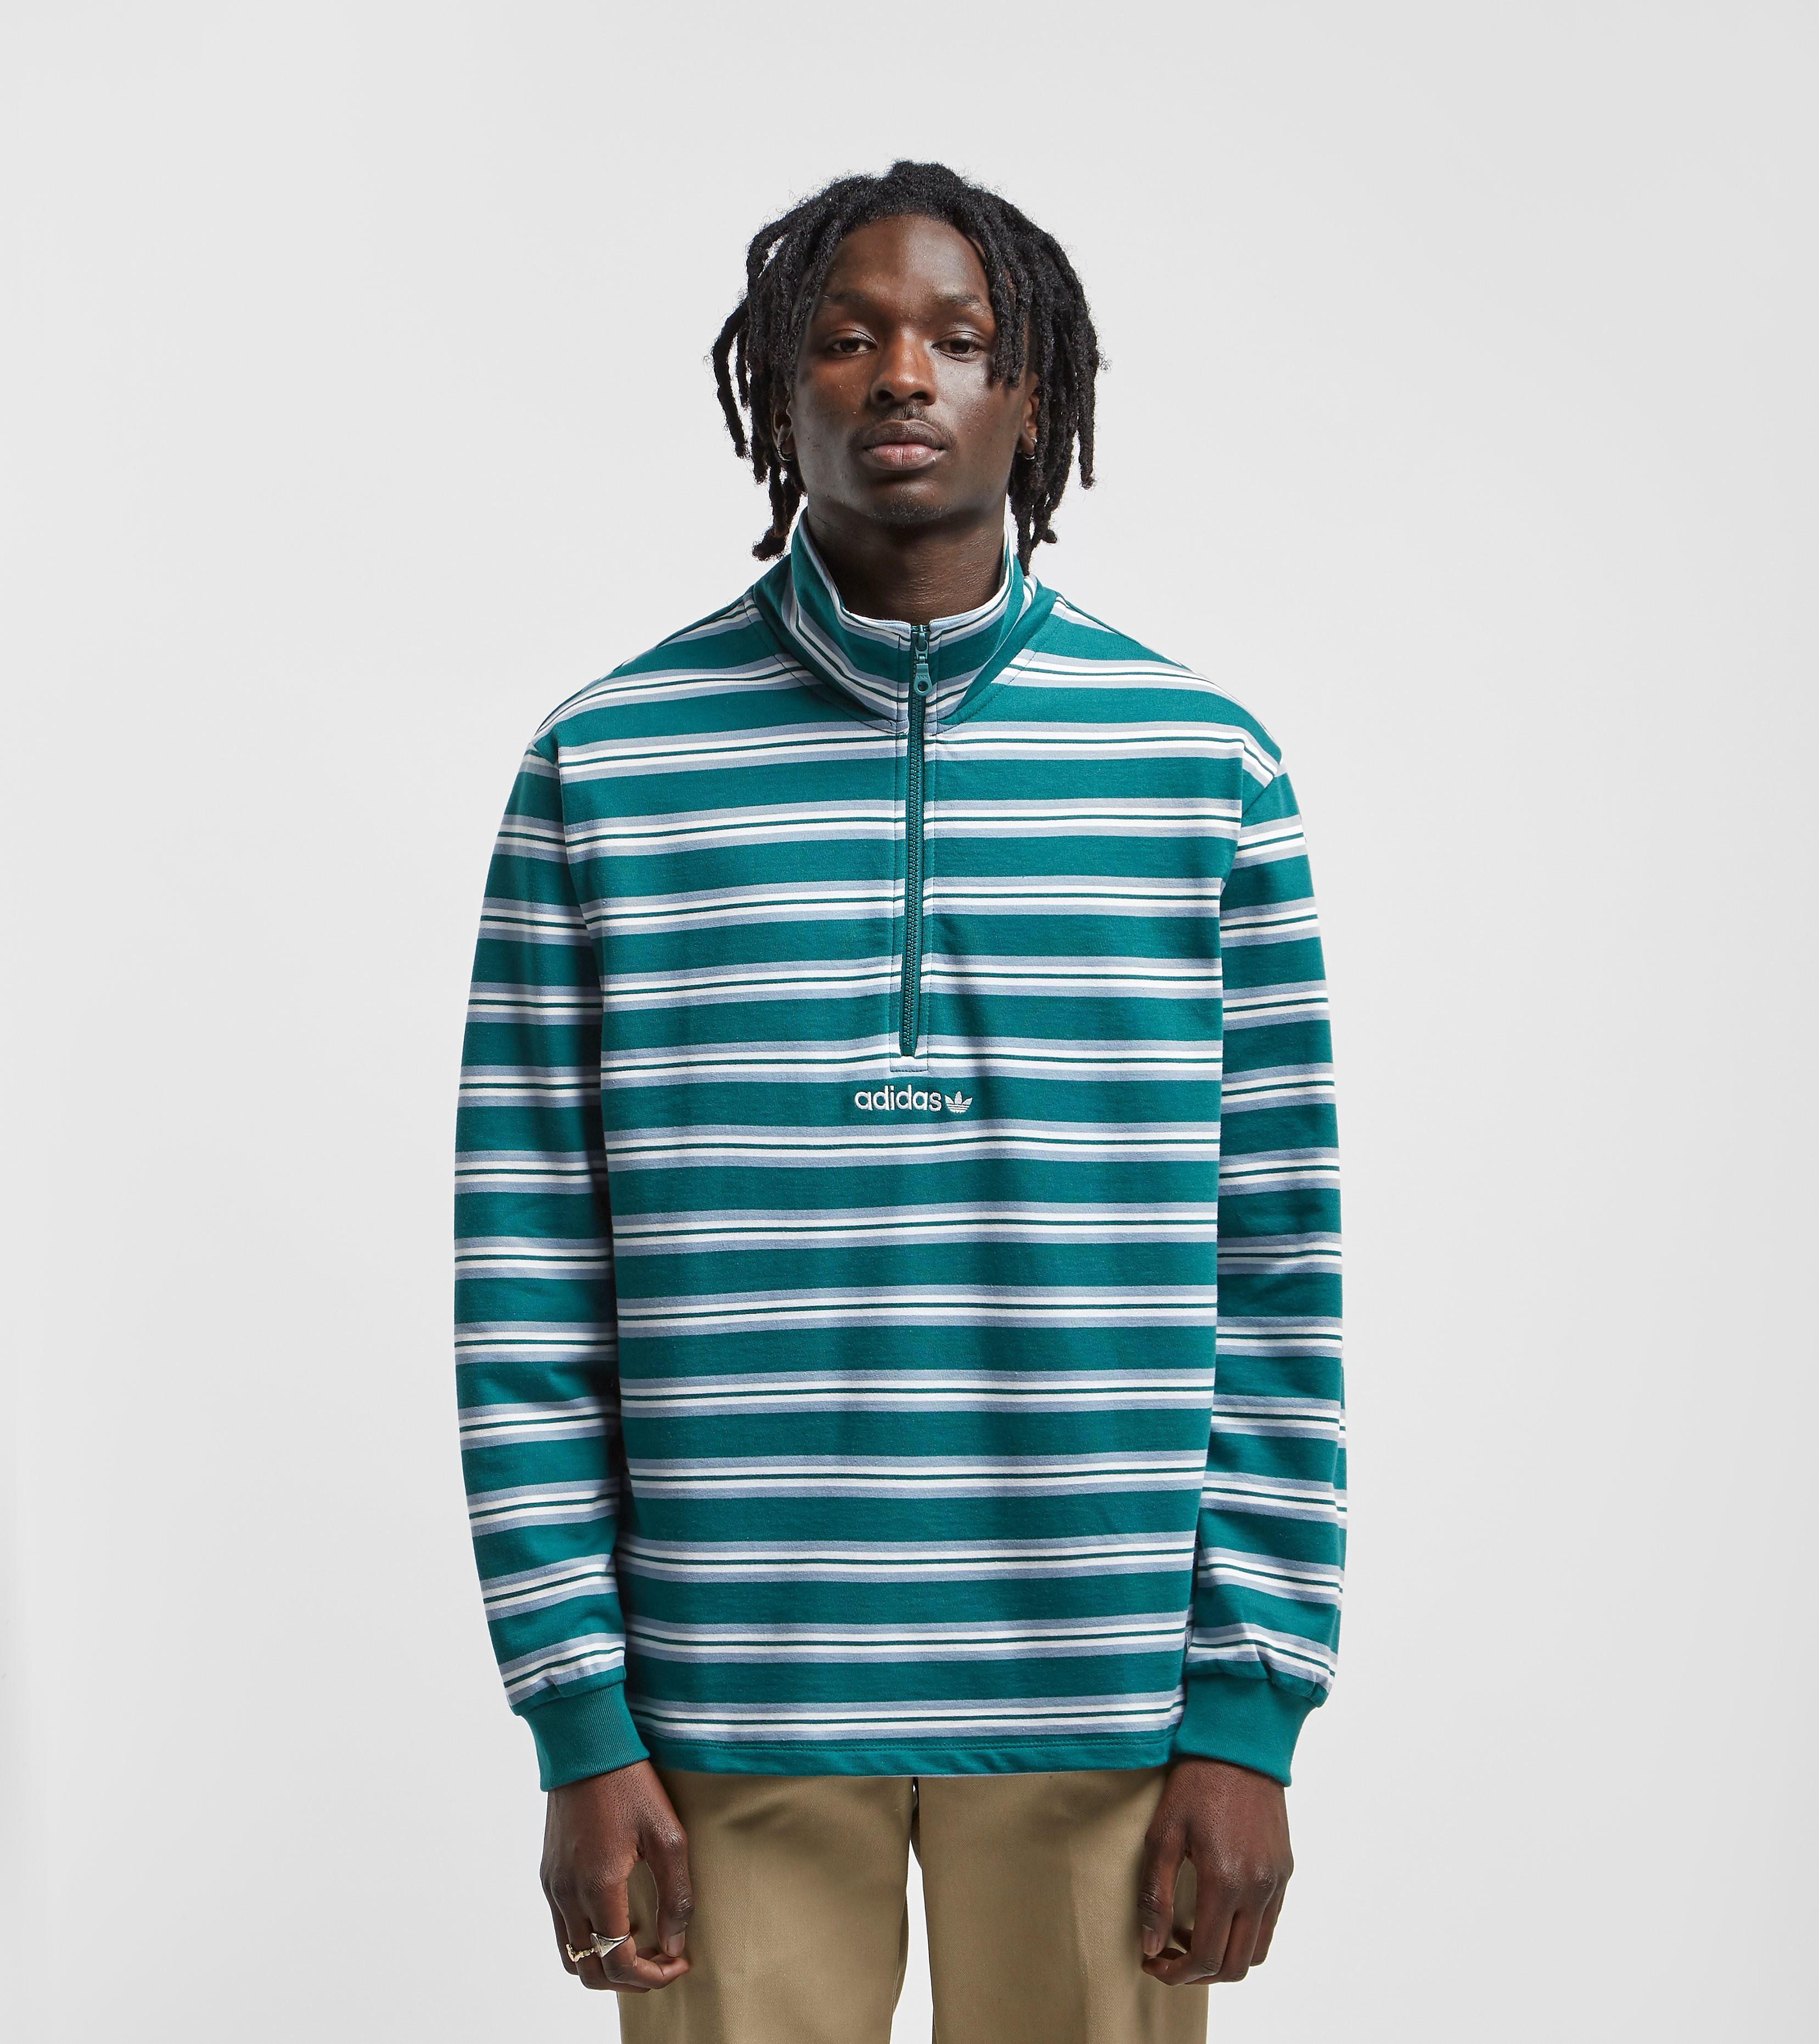 Adidas Originals Clothing Men S T Shirts Hoodies Tracksuits Size